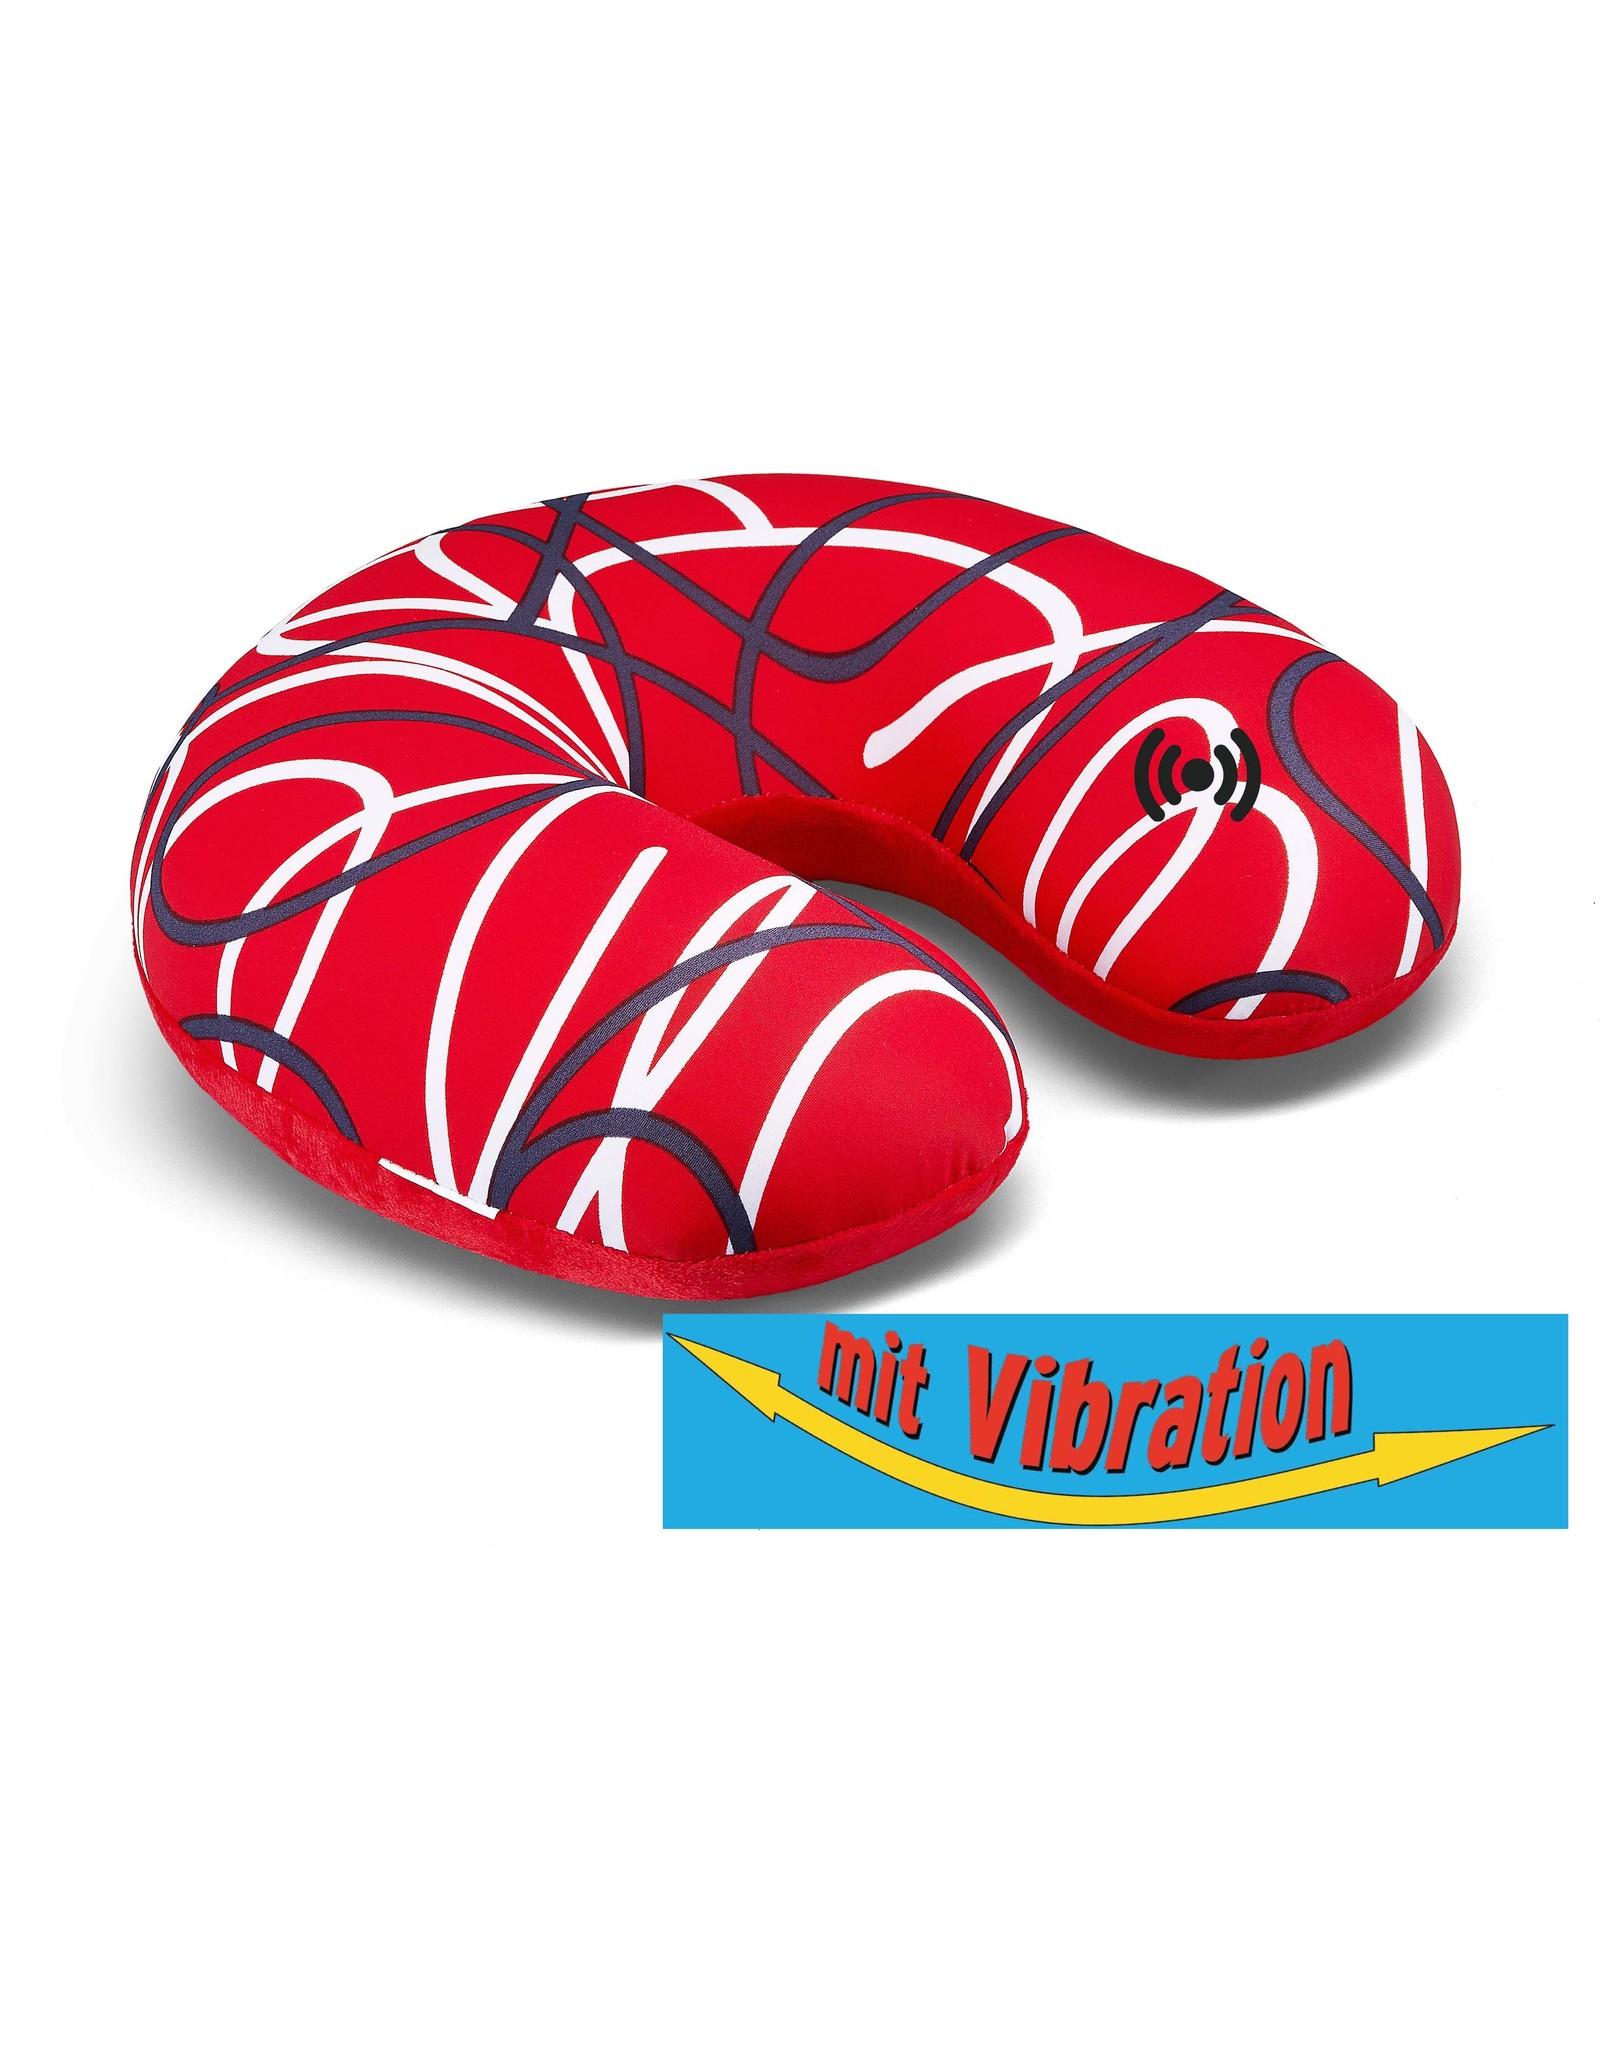 Kuschel-Maxx Kuschel-Maxx - Nack cushion Linien Rot - Vibration